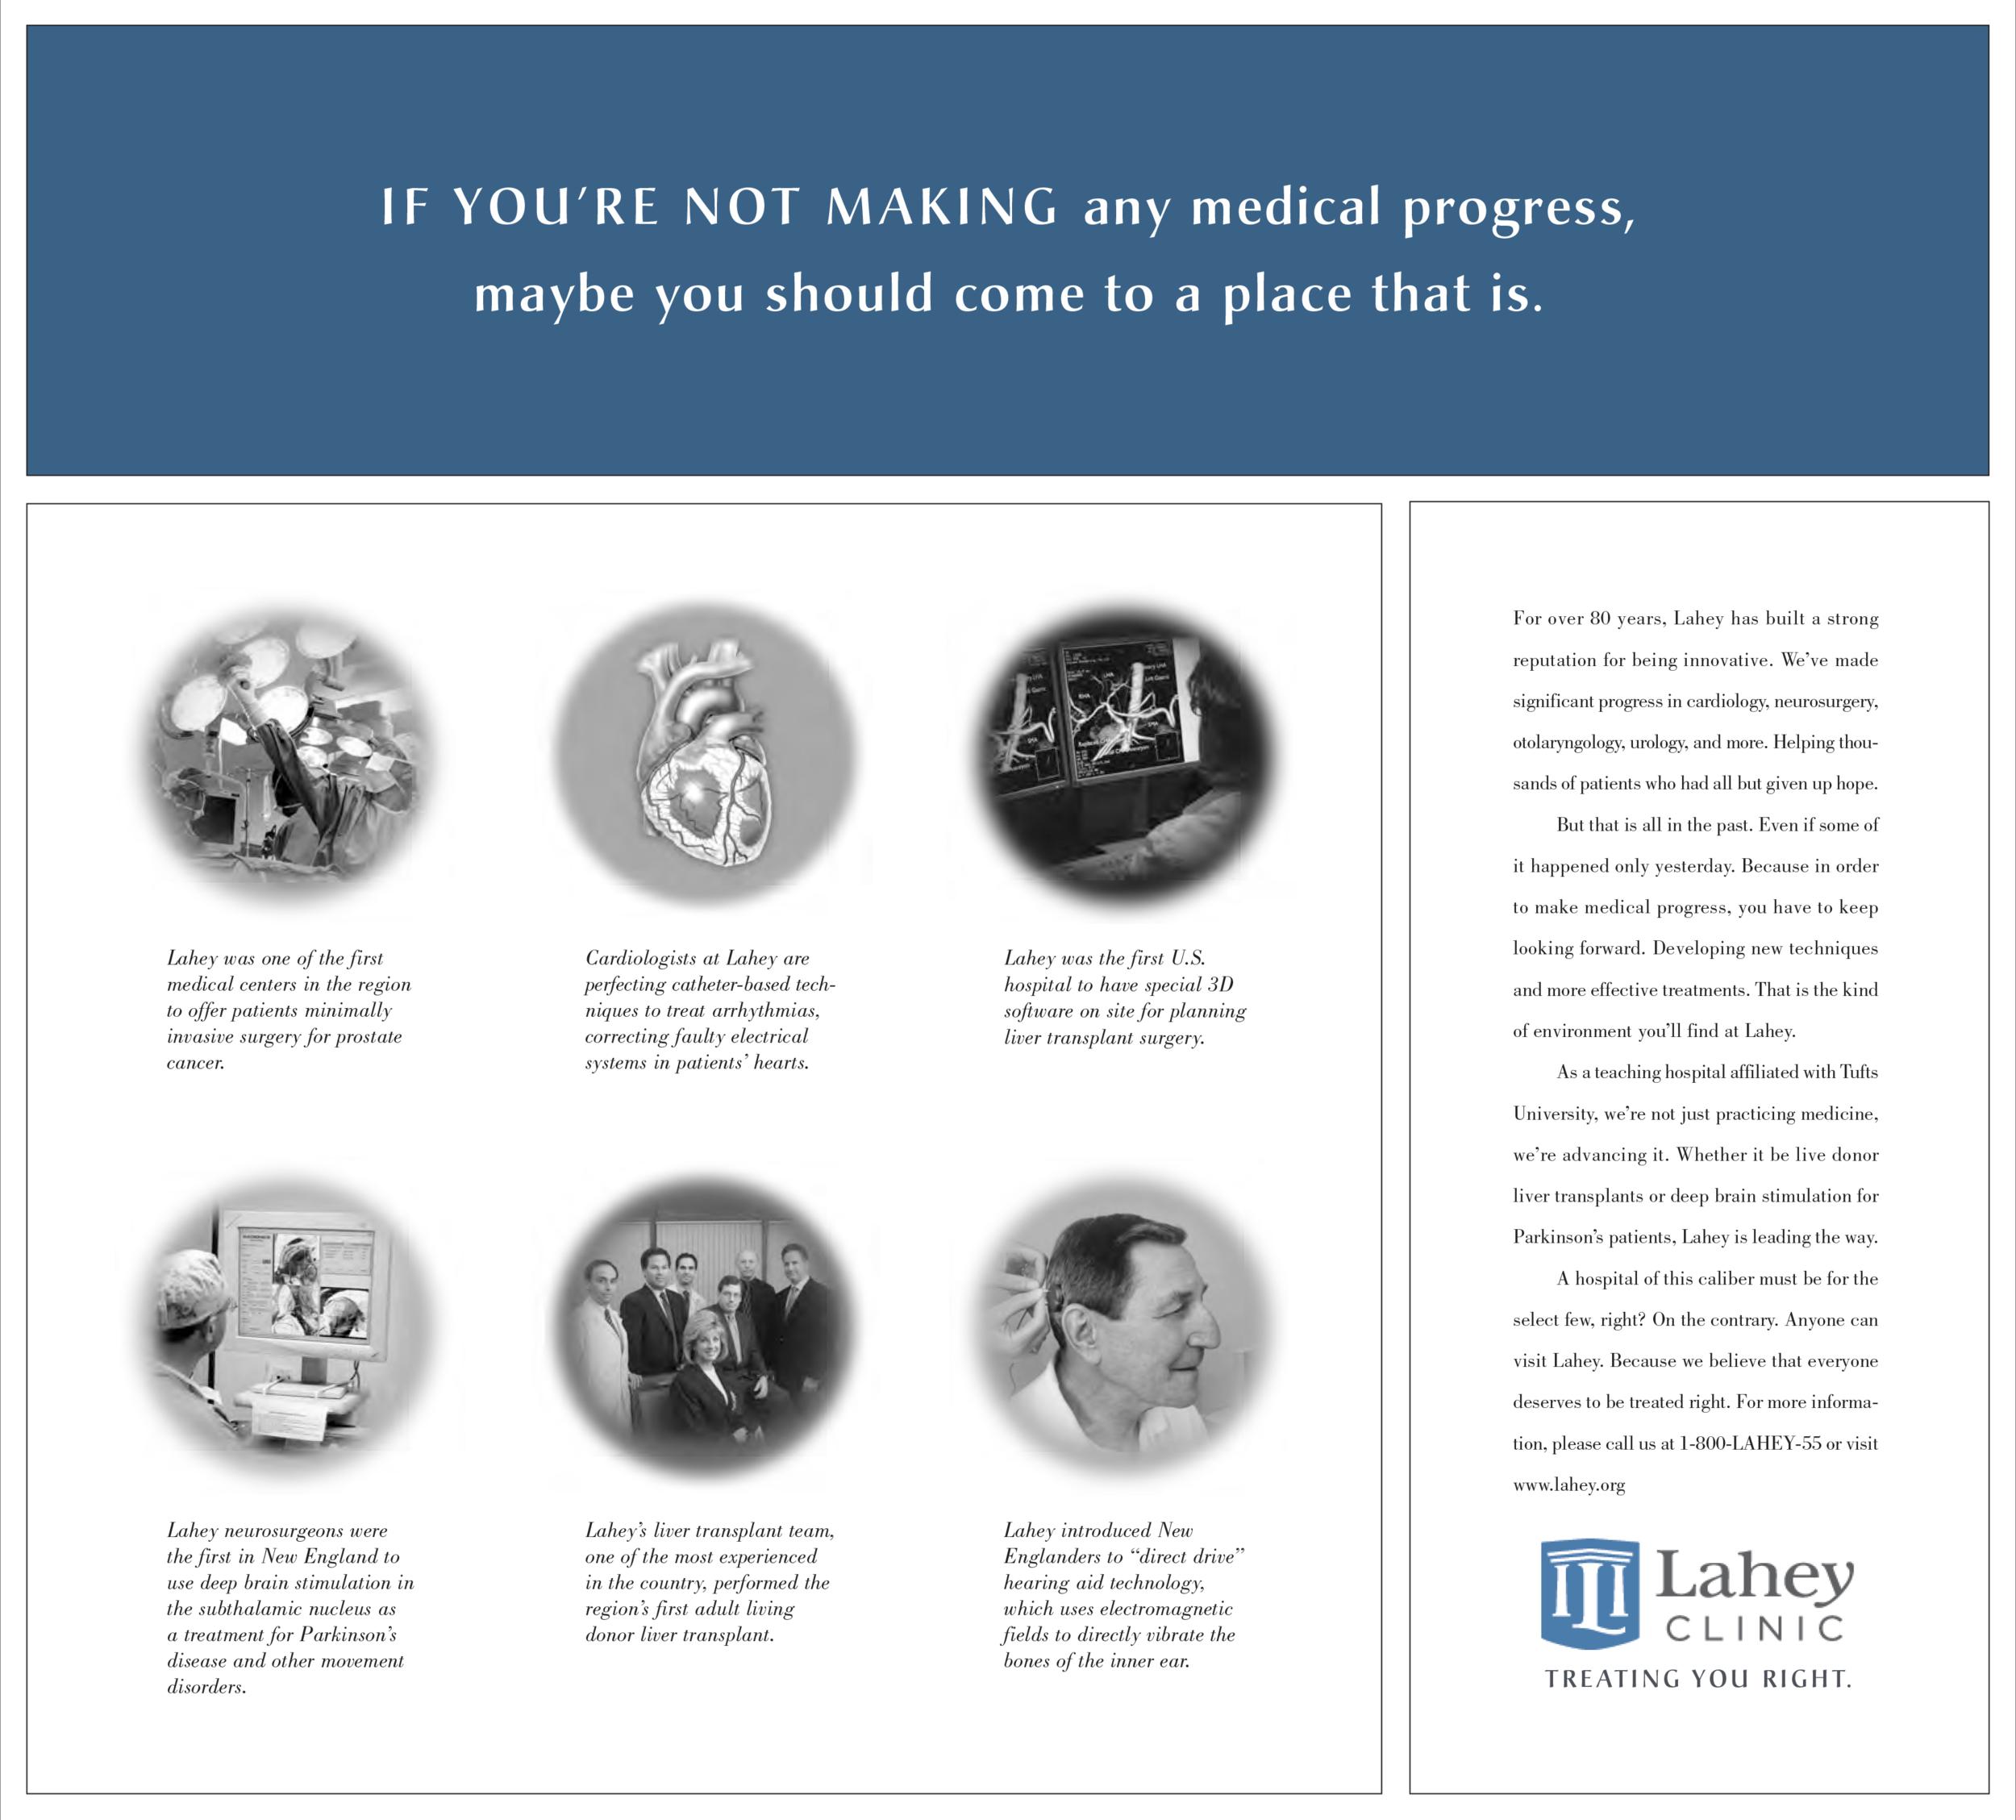 Lahey Health Bona Fide Creative medical progress